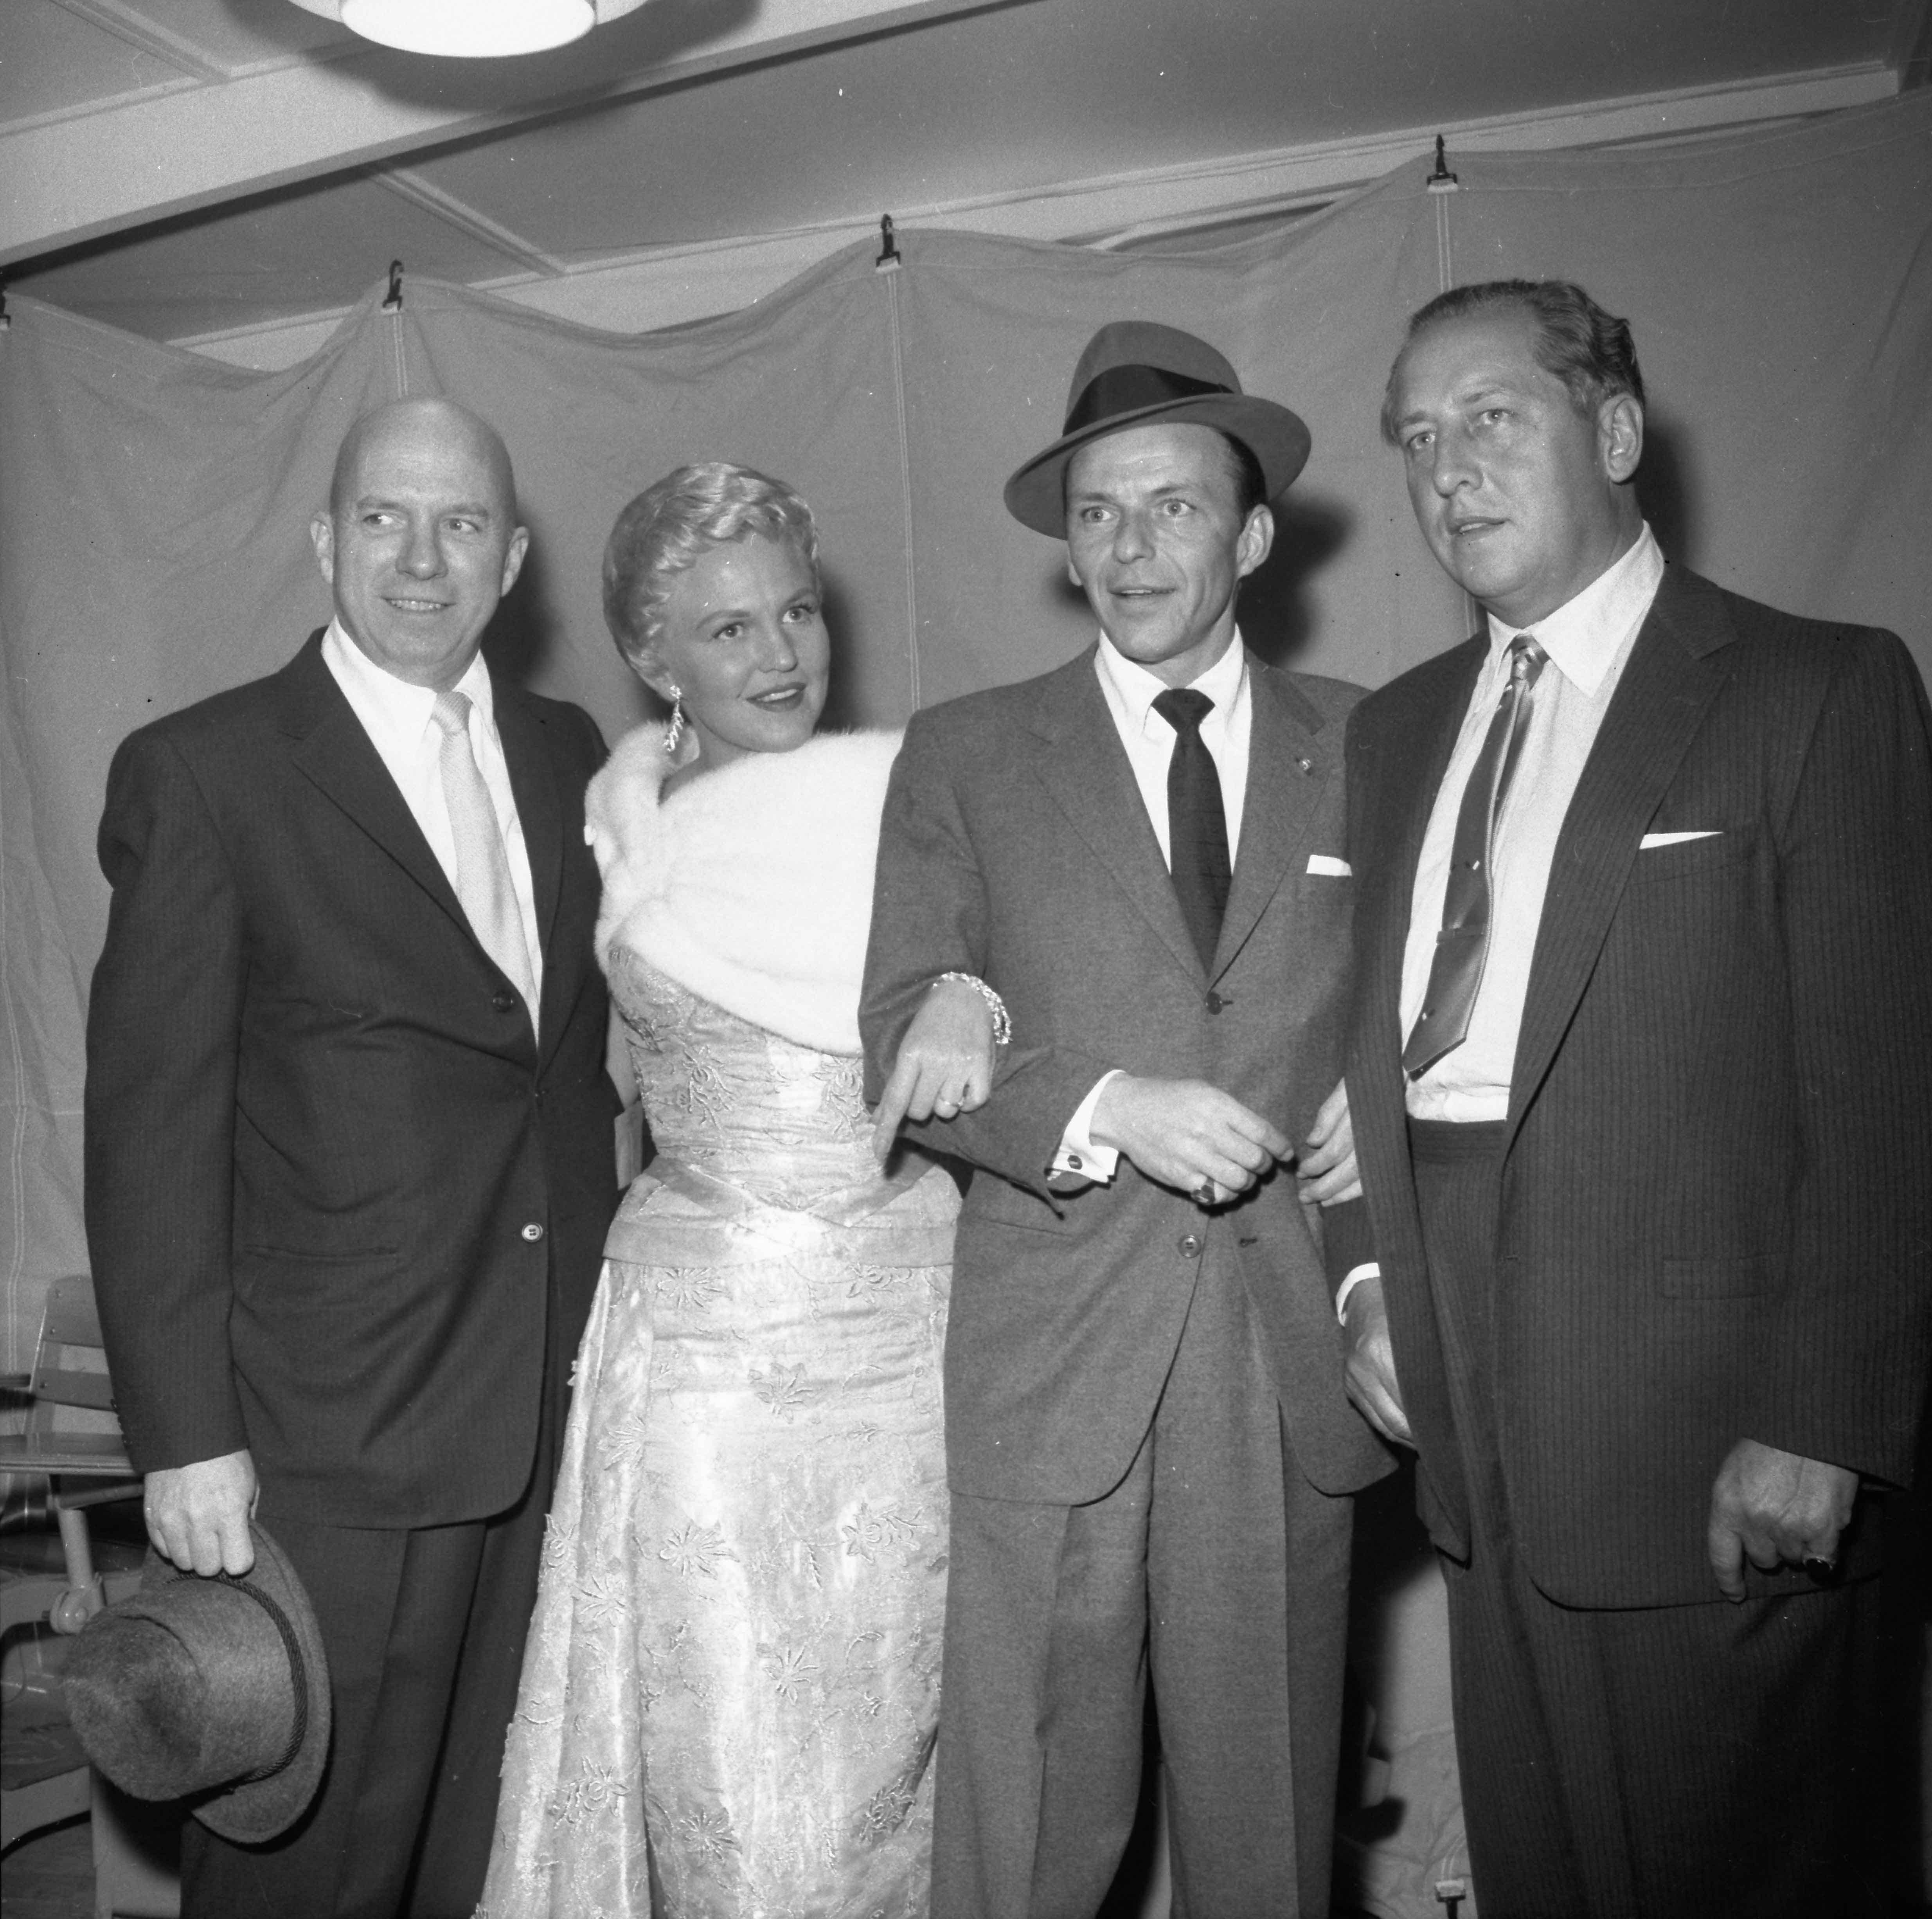 The high-flying mid-century lifestyle of Jimmy Van Heusen